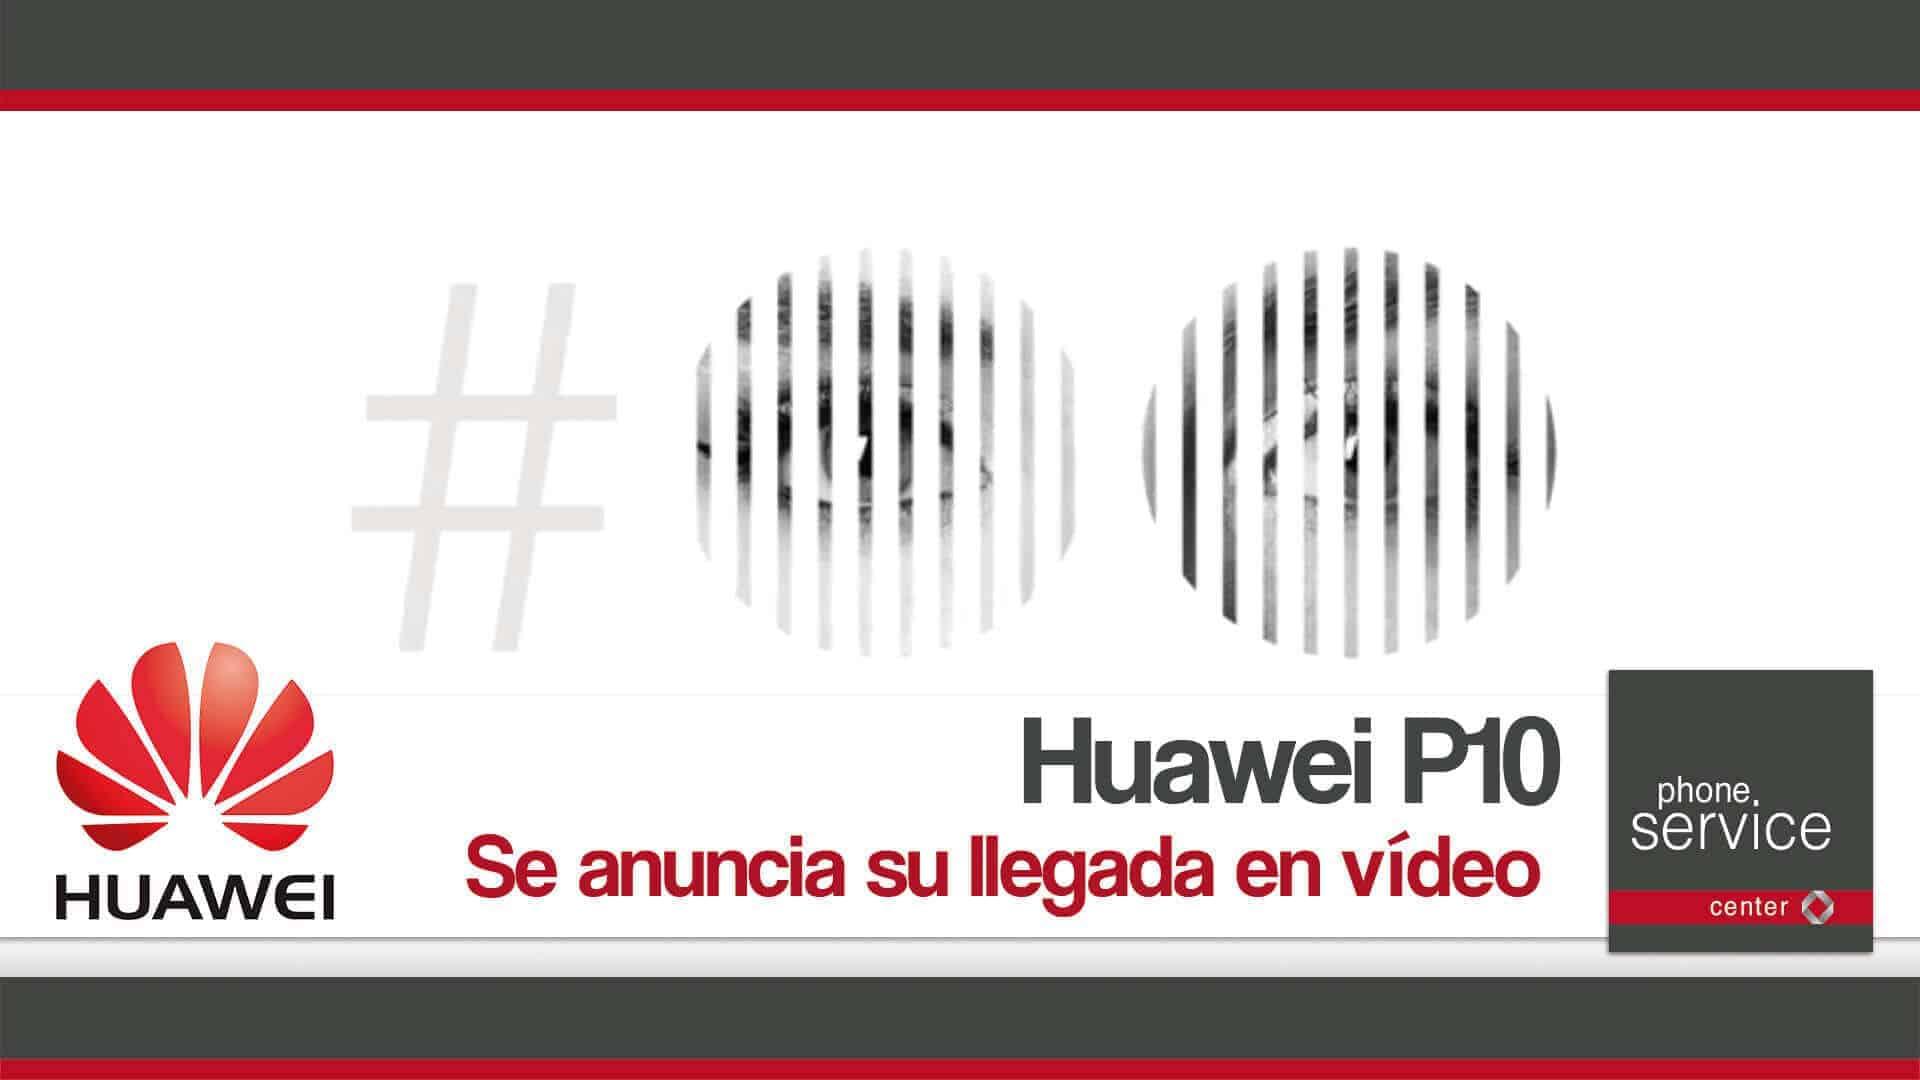 Huawei P10 anuncia su llegada